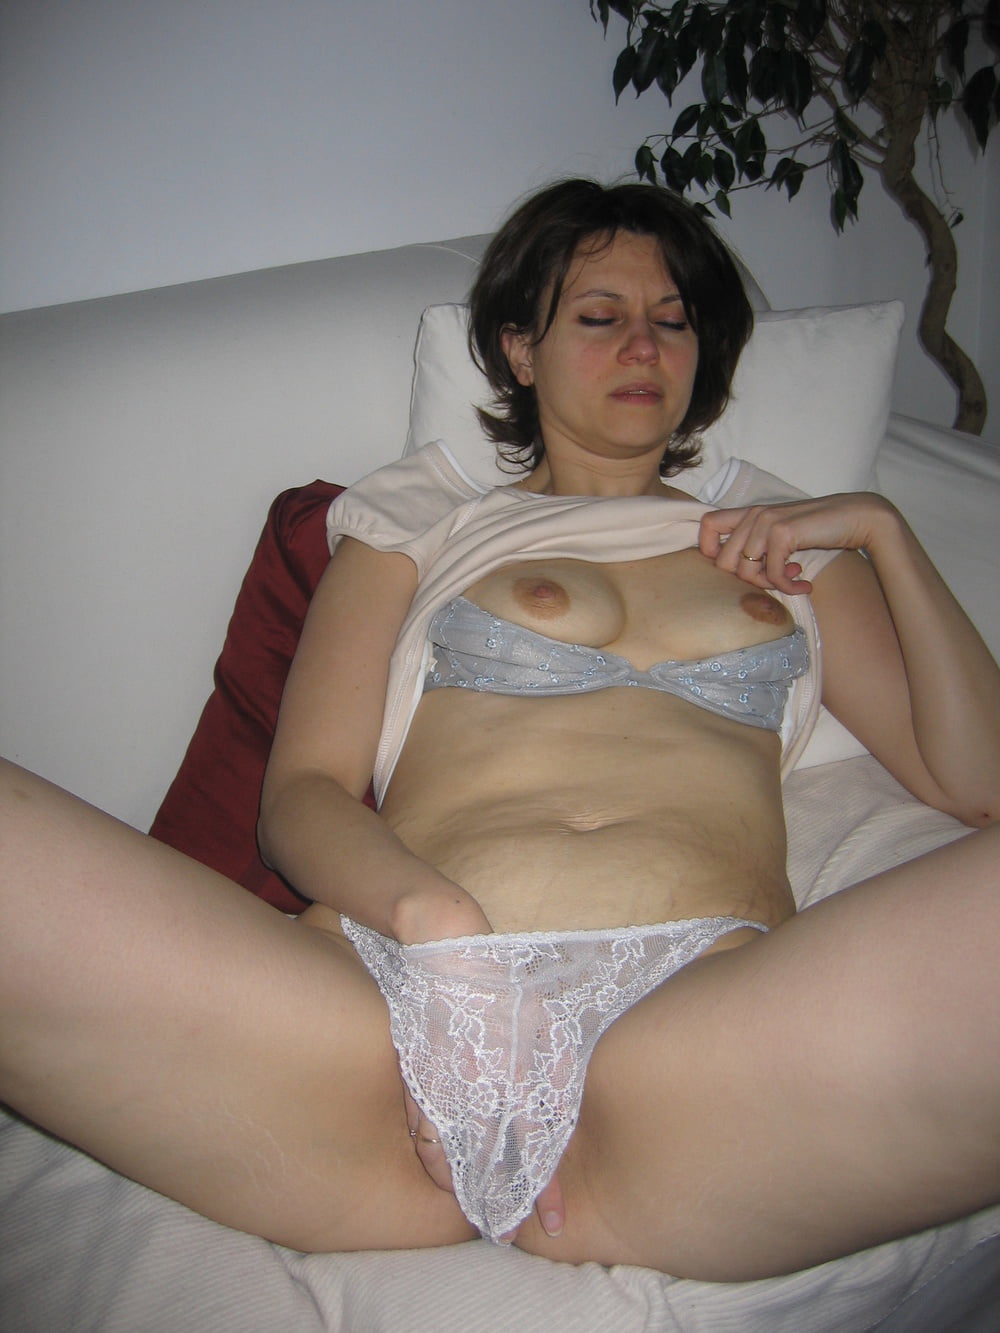 seksi-tetenki-v-trusikah-i-bez-foto-domashnee-onlayn